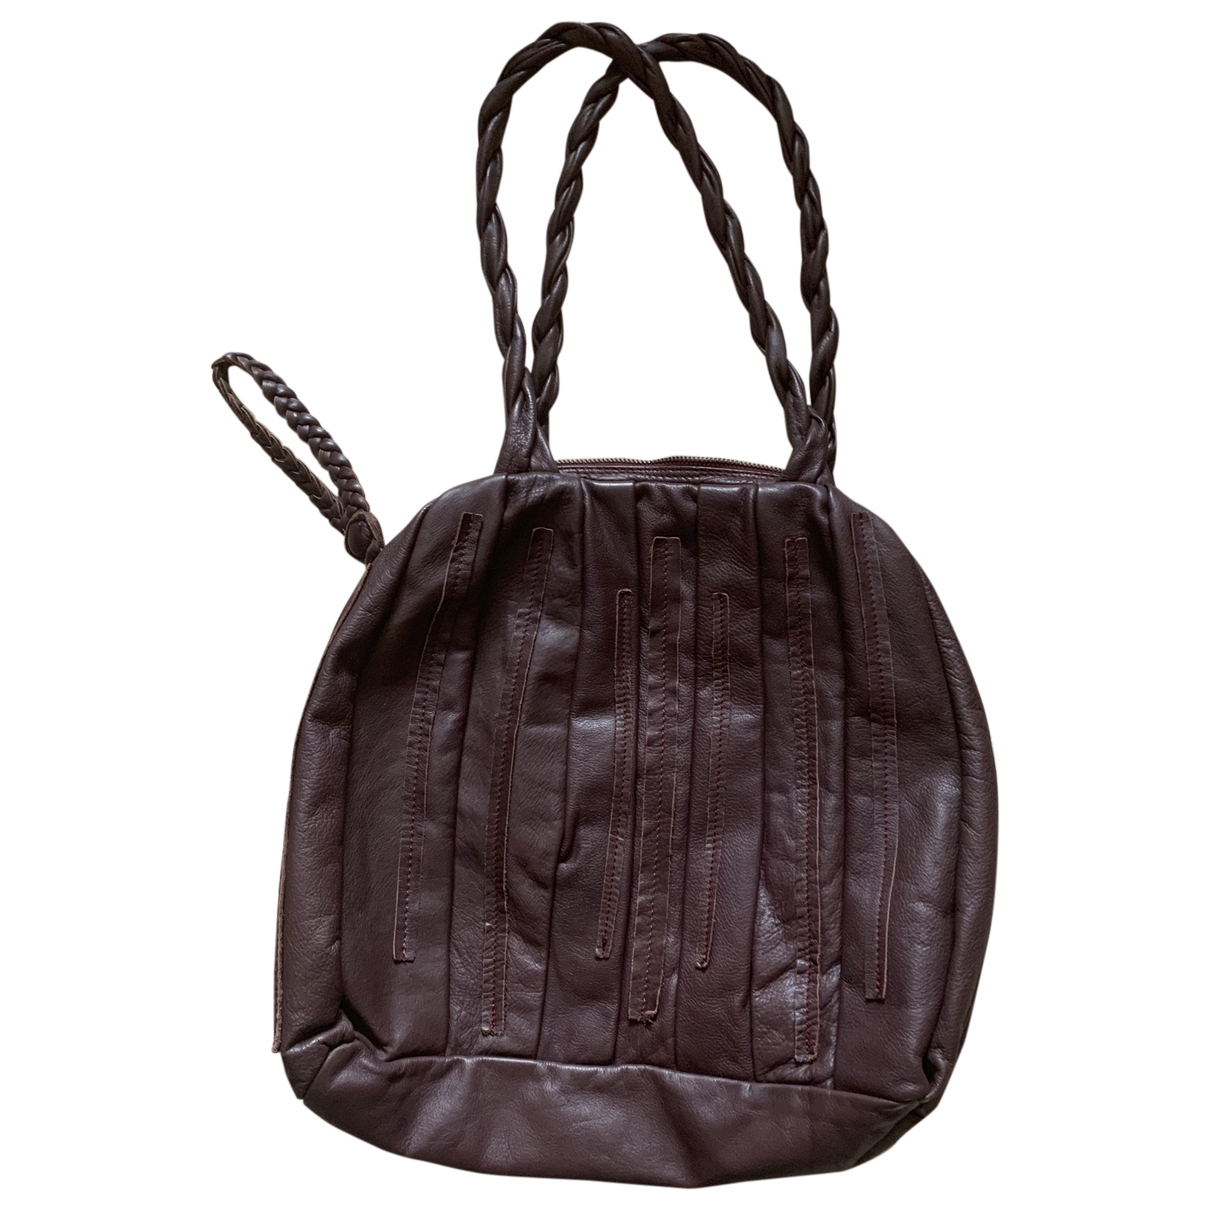 Elena Miro \N Burgundy Leather handbag for Women \N